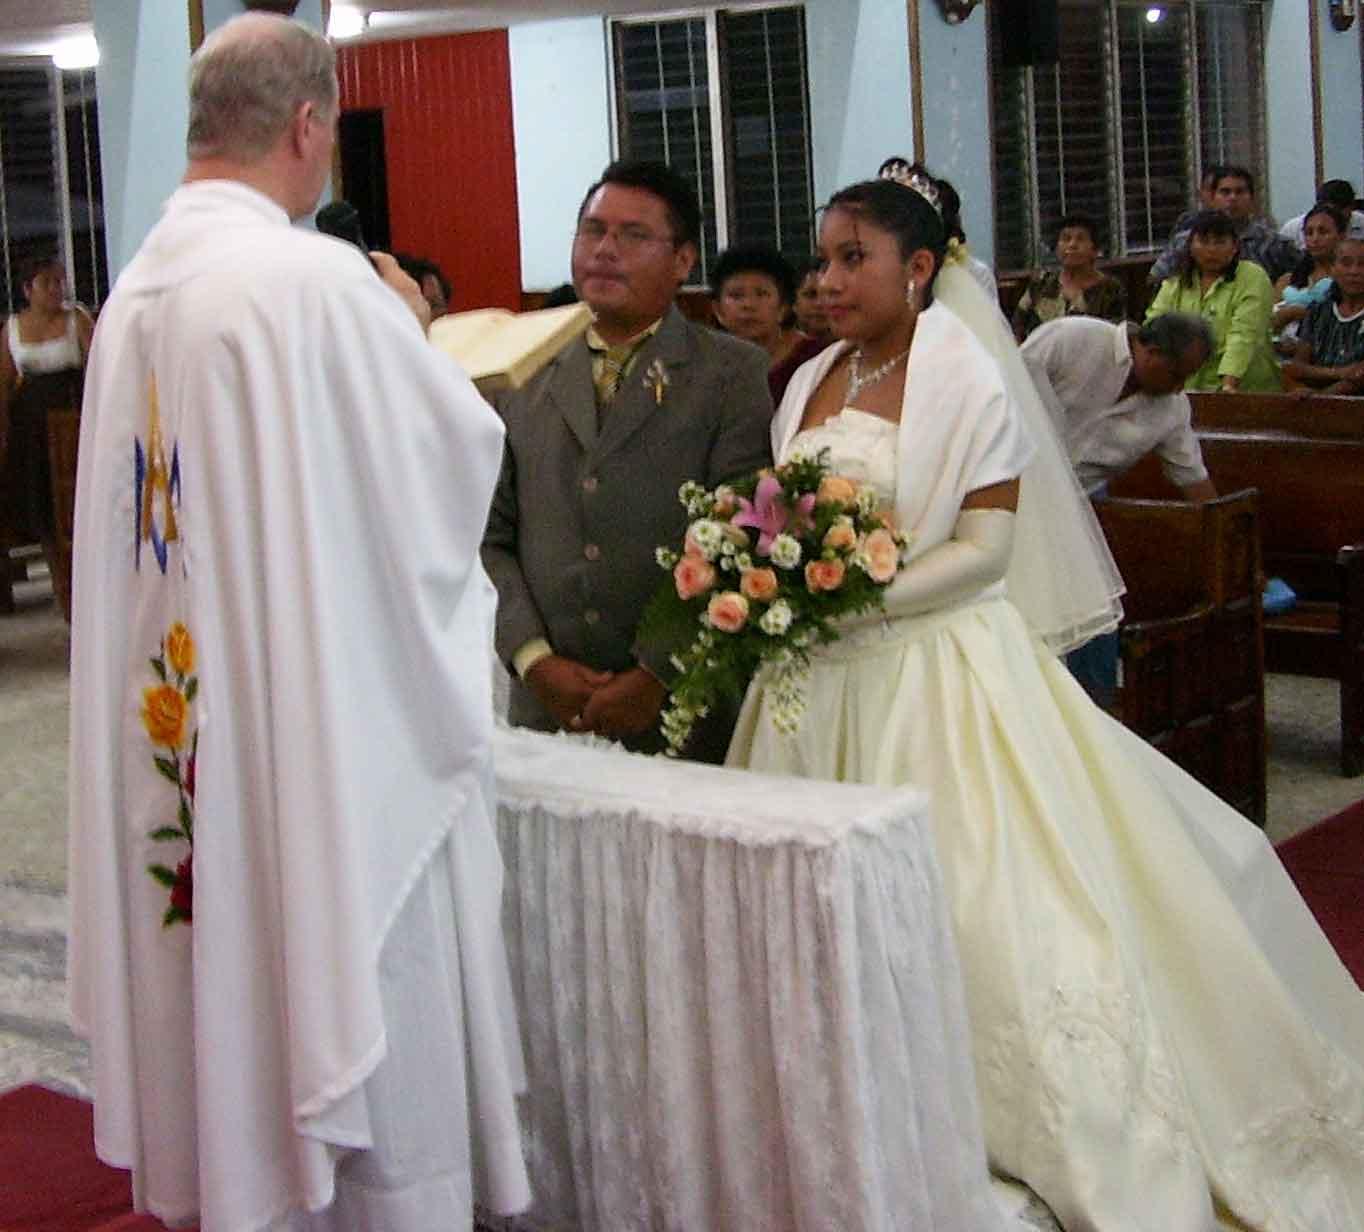 Matrimonio Catolico Y Cristiano : La santidad como tarea el matrimonio